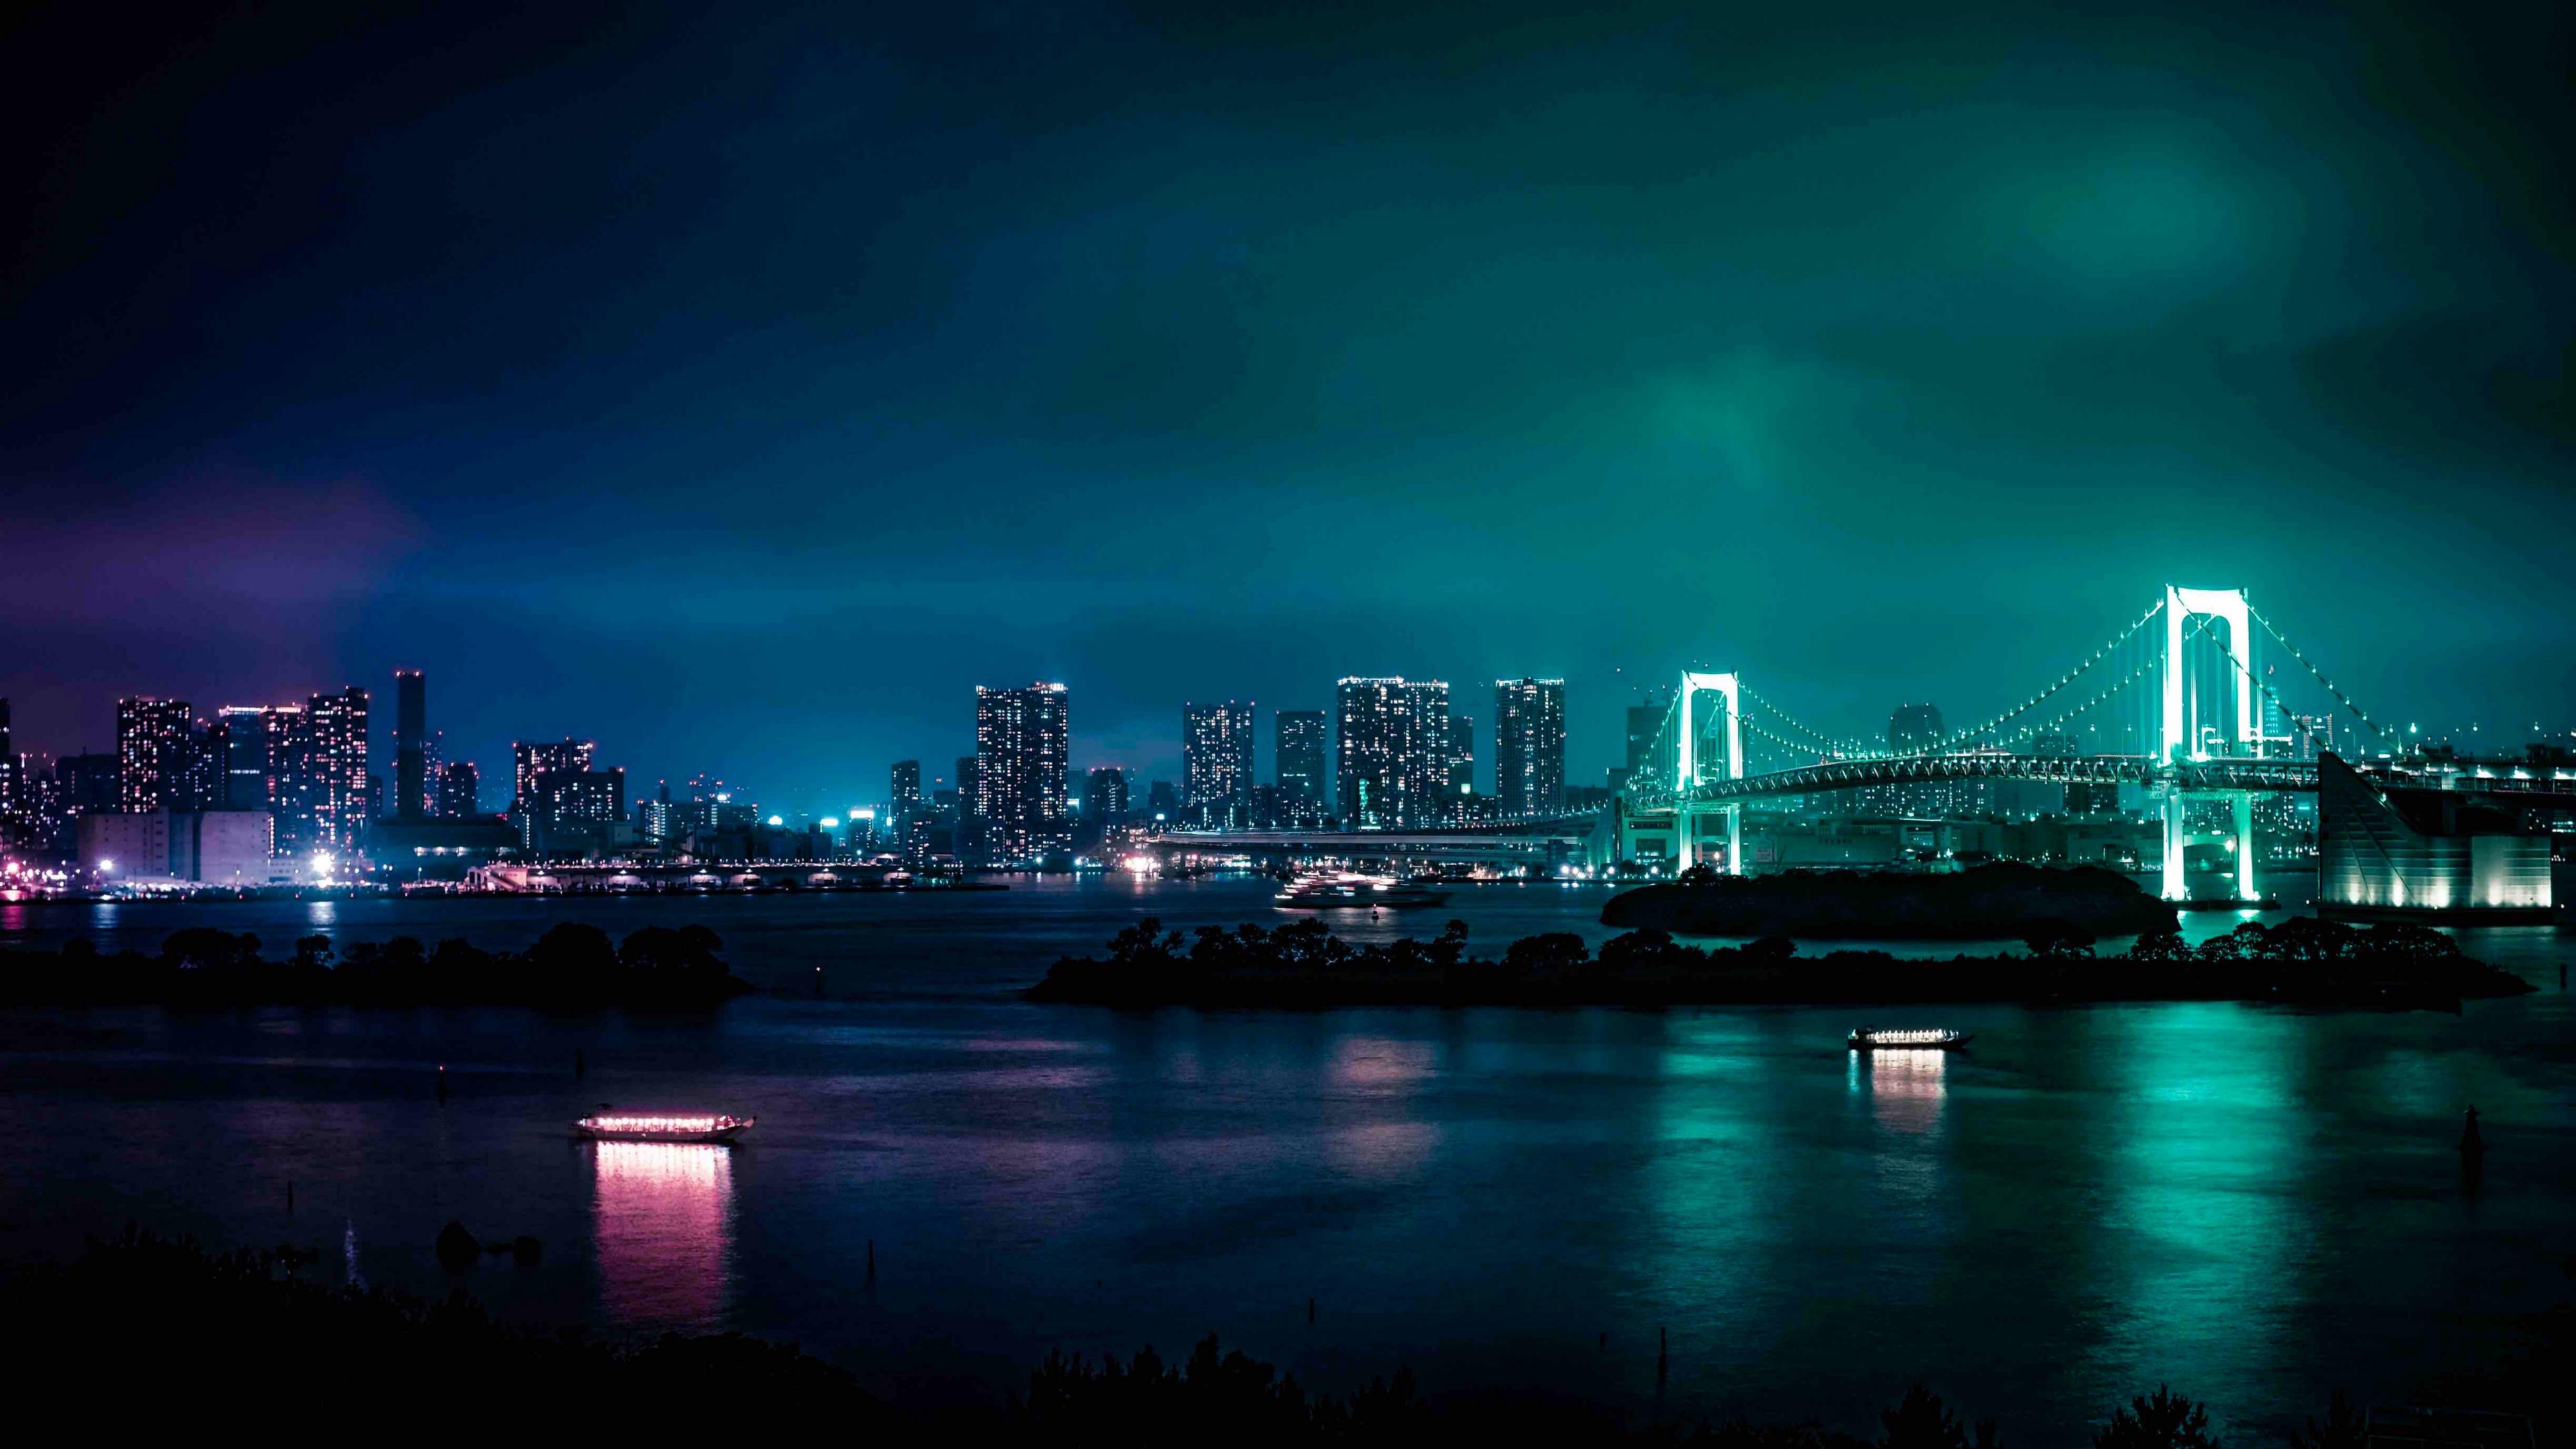 minato, japan, night city, bridge 4k night city, minato, Japan